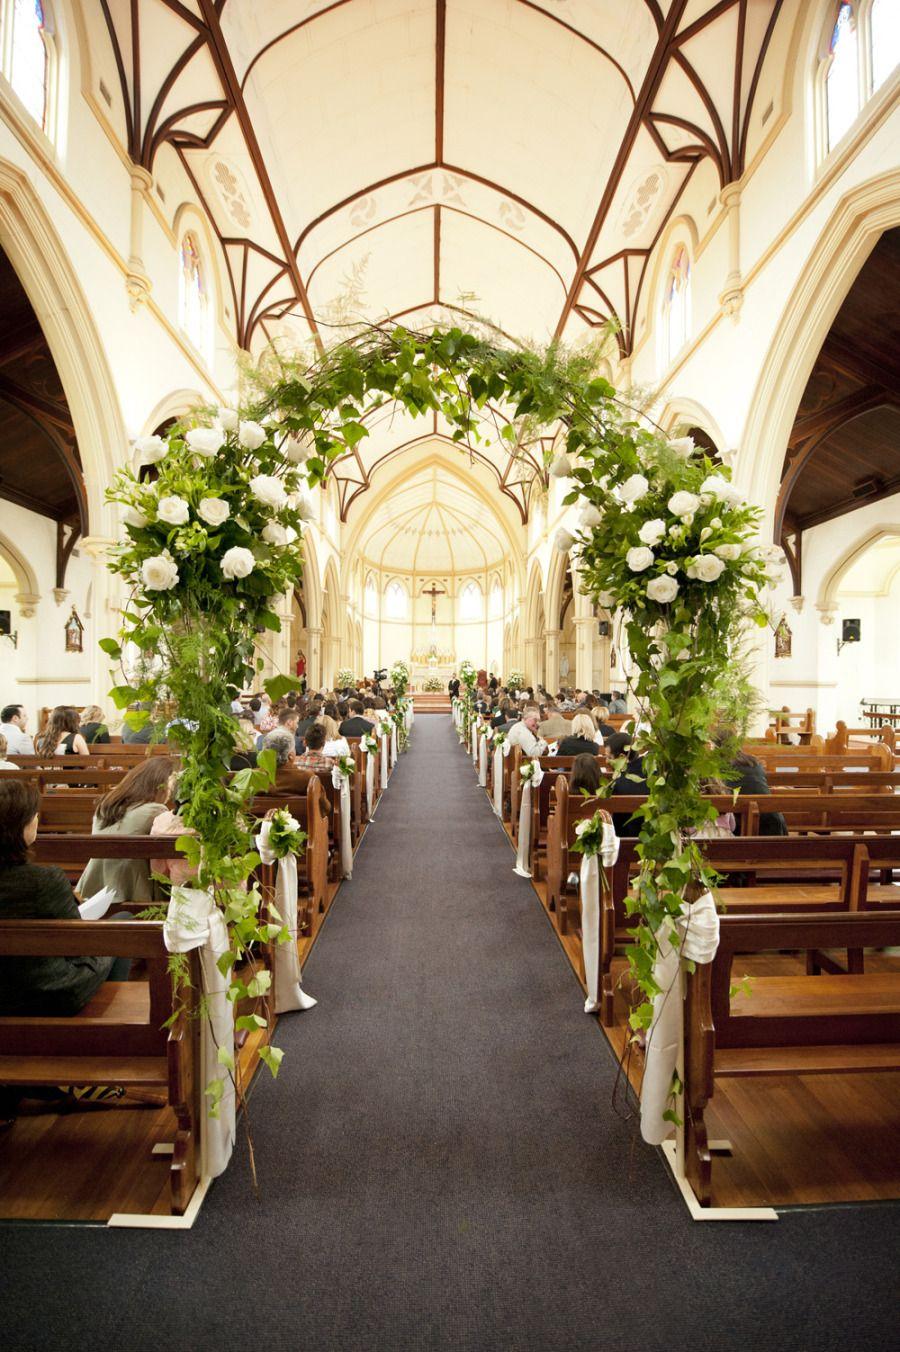 Wedding decorations inside church  Traditional Perth Wedding  wedding  Pinterest  Perth Arch and